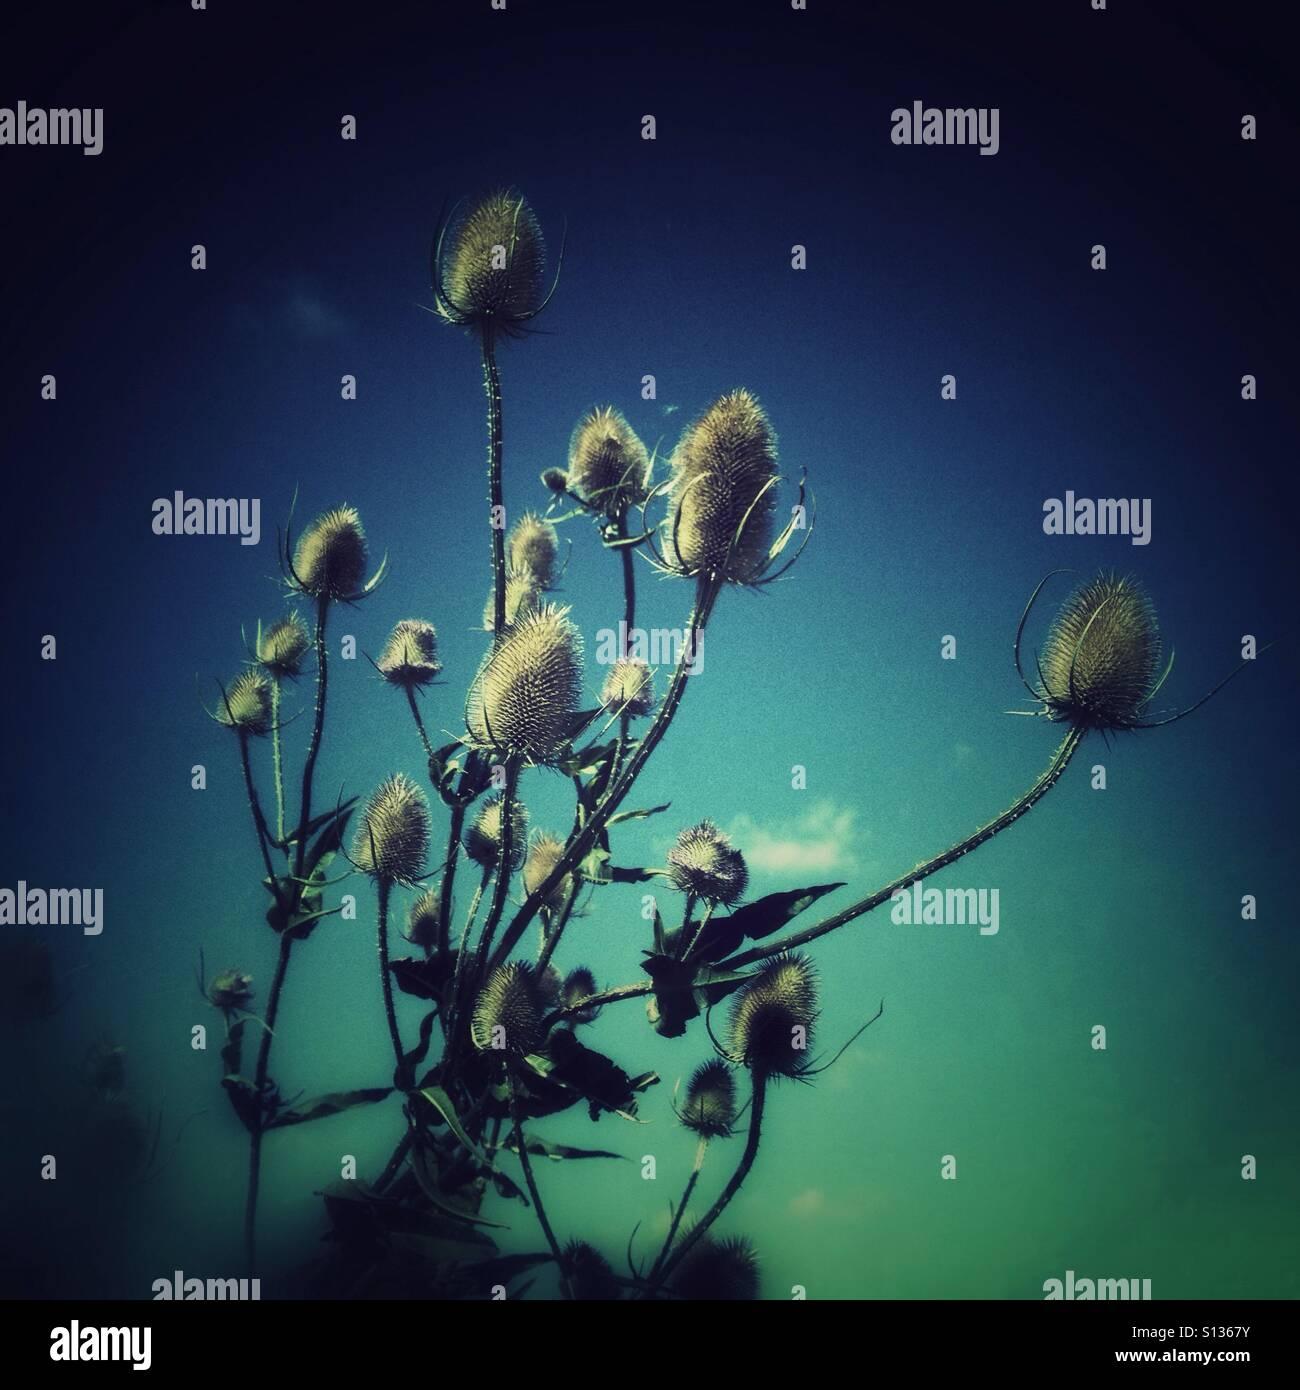 Teasal flowers - Stock Image